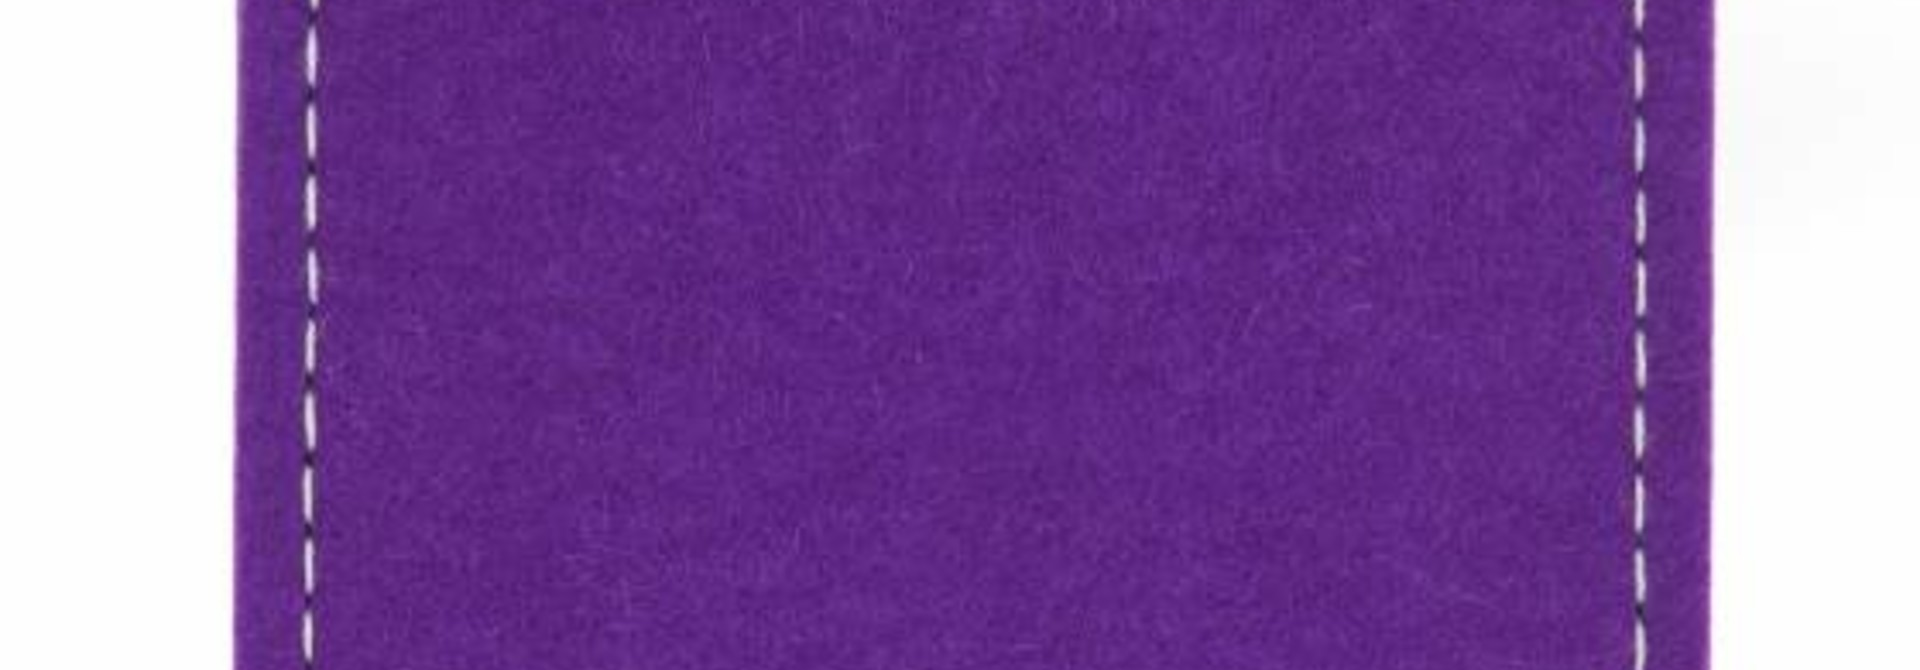 Mi / Redmi Sleeve Purple